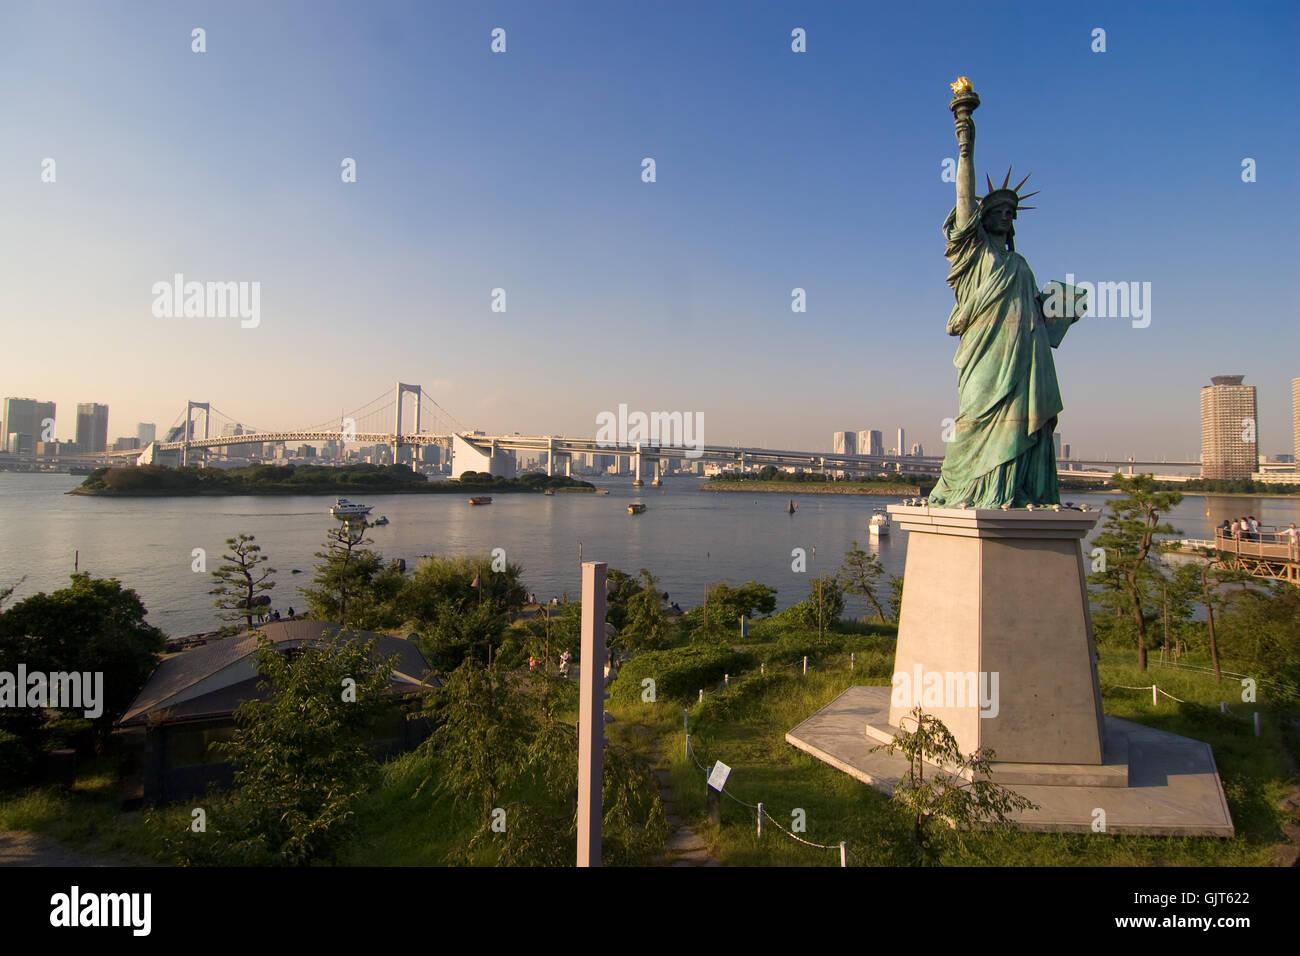 new york tokyo - Stock Image